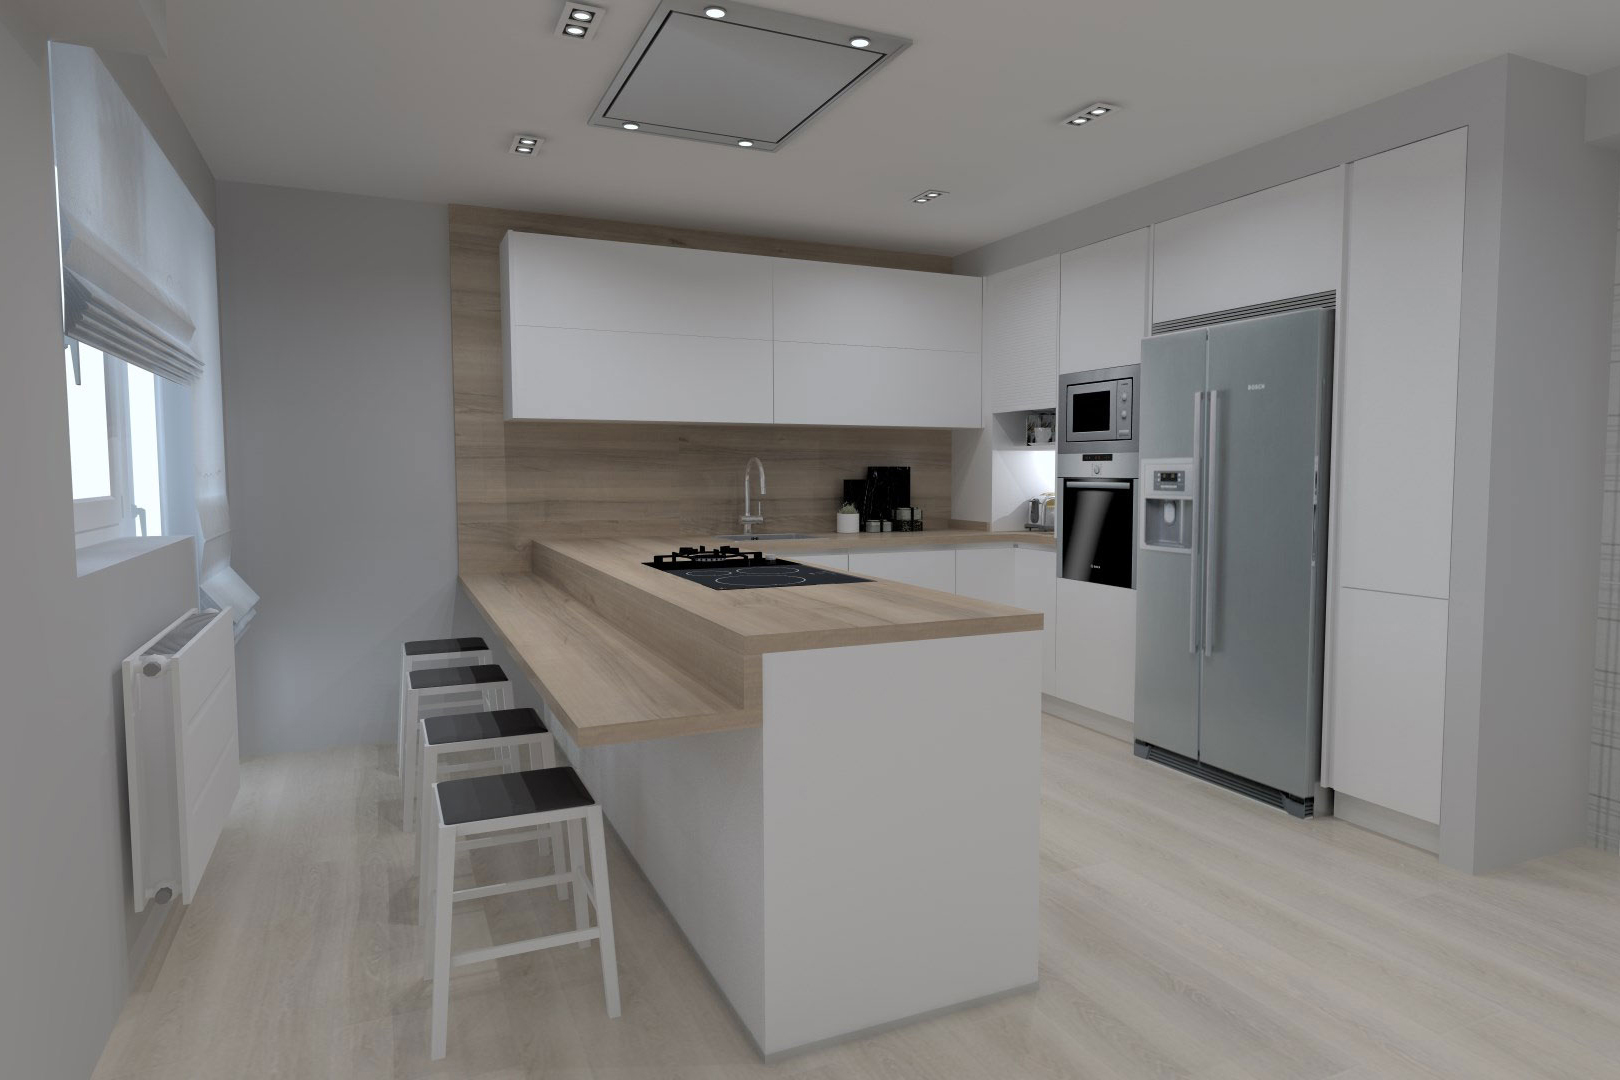 14 ideas de cocinas blancas para inspirarte santiago interiores - Cocinas blancas lacadas ...